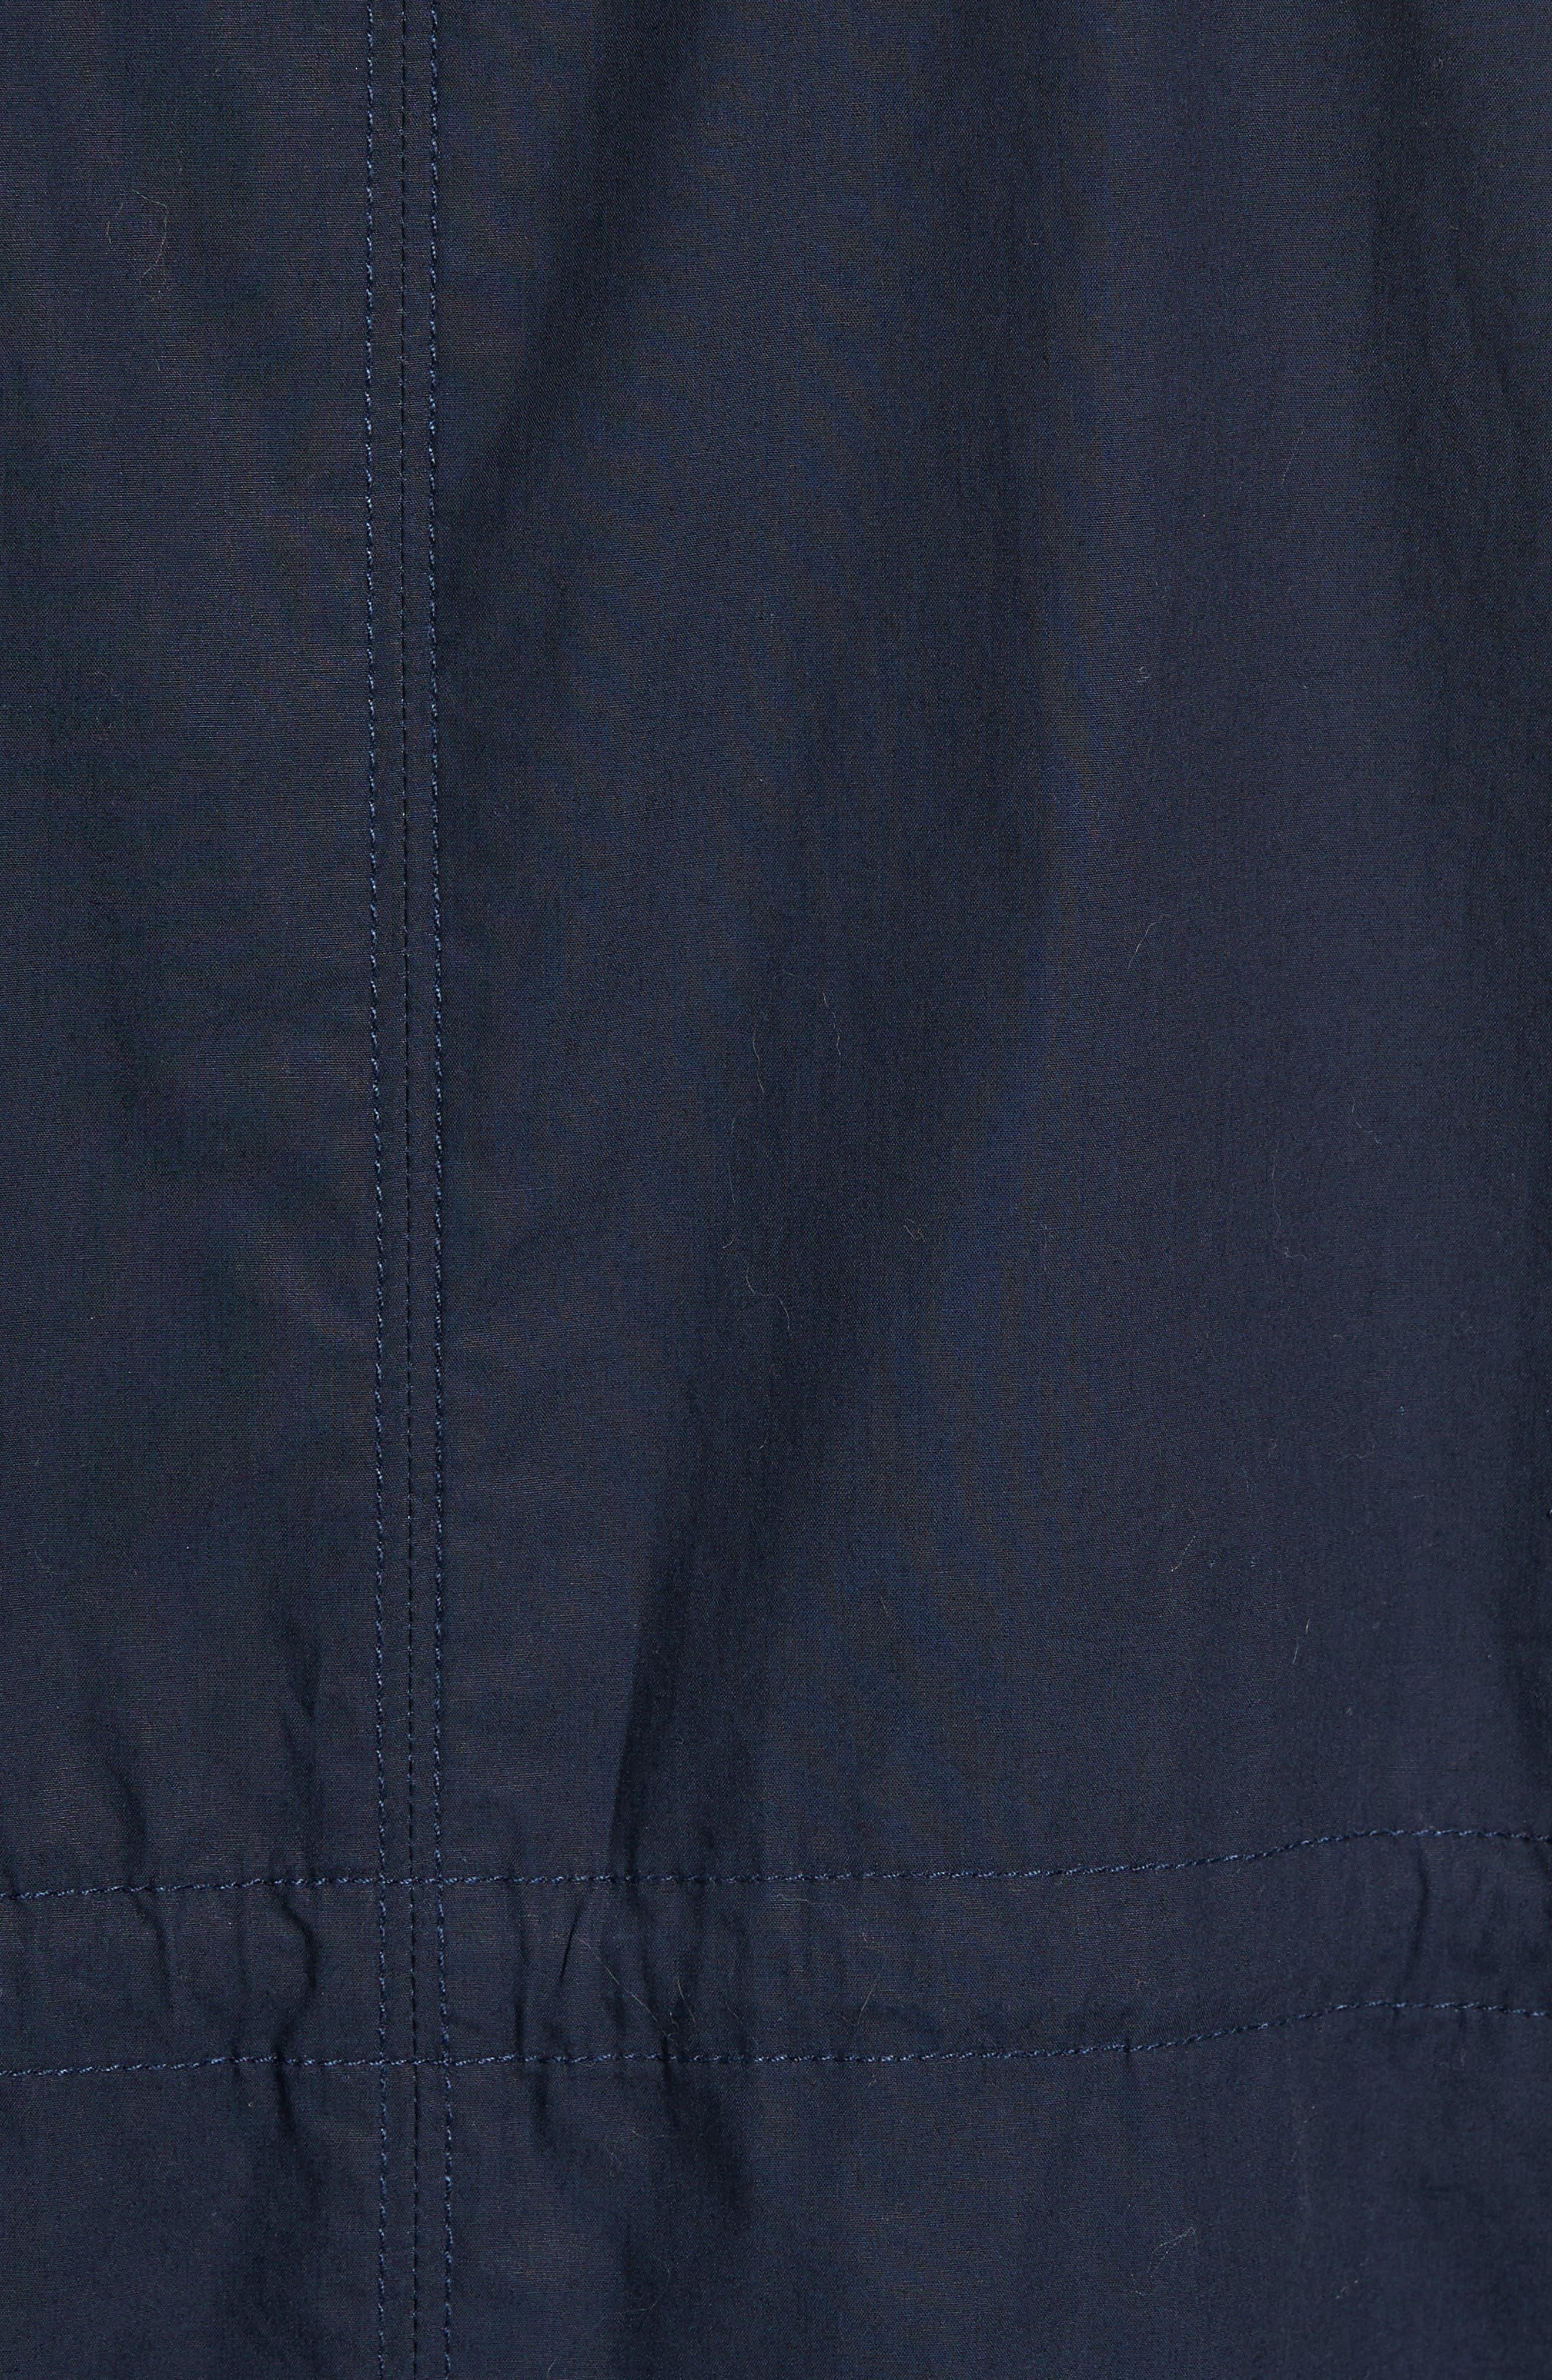 Breakaway Trench Coat,                             Alternate thumbnail 5, color,                             Navy